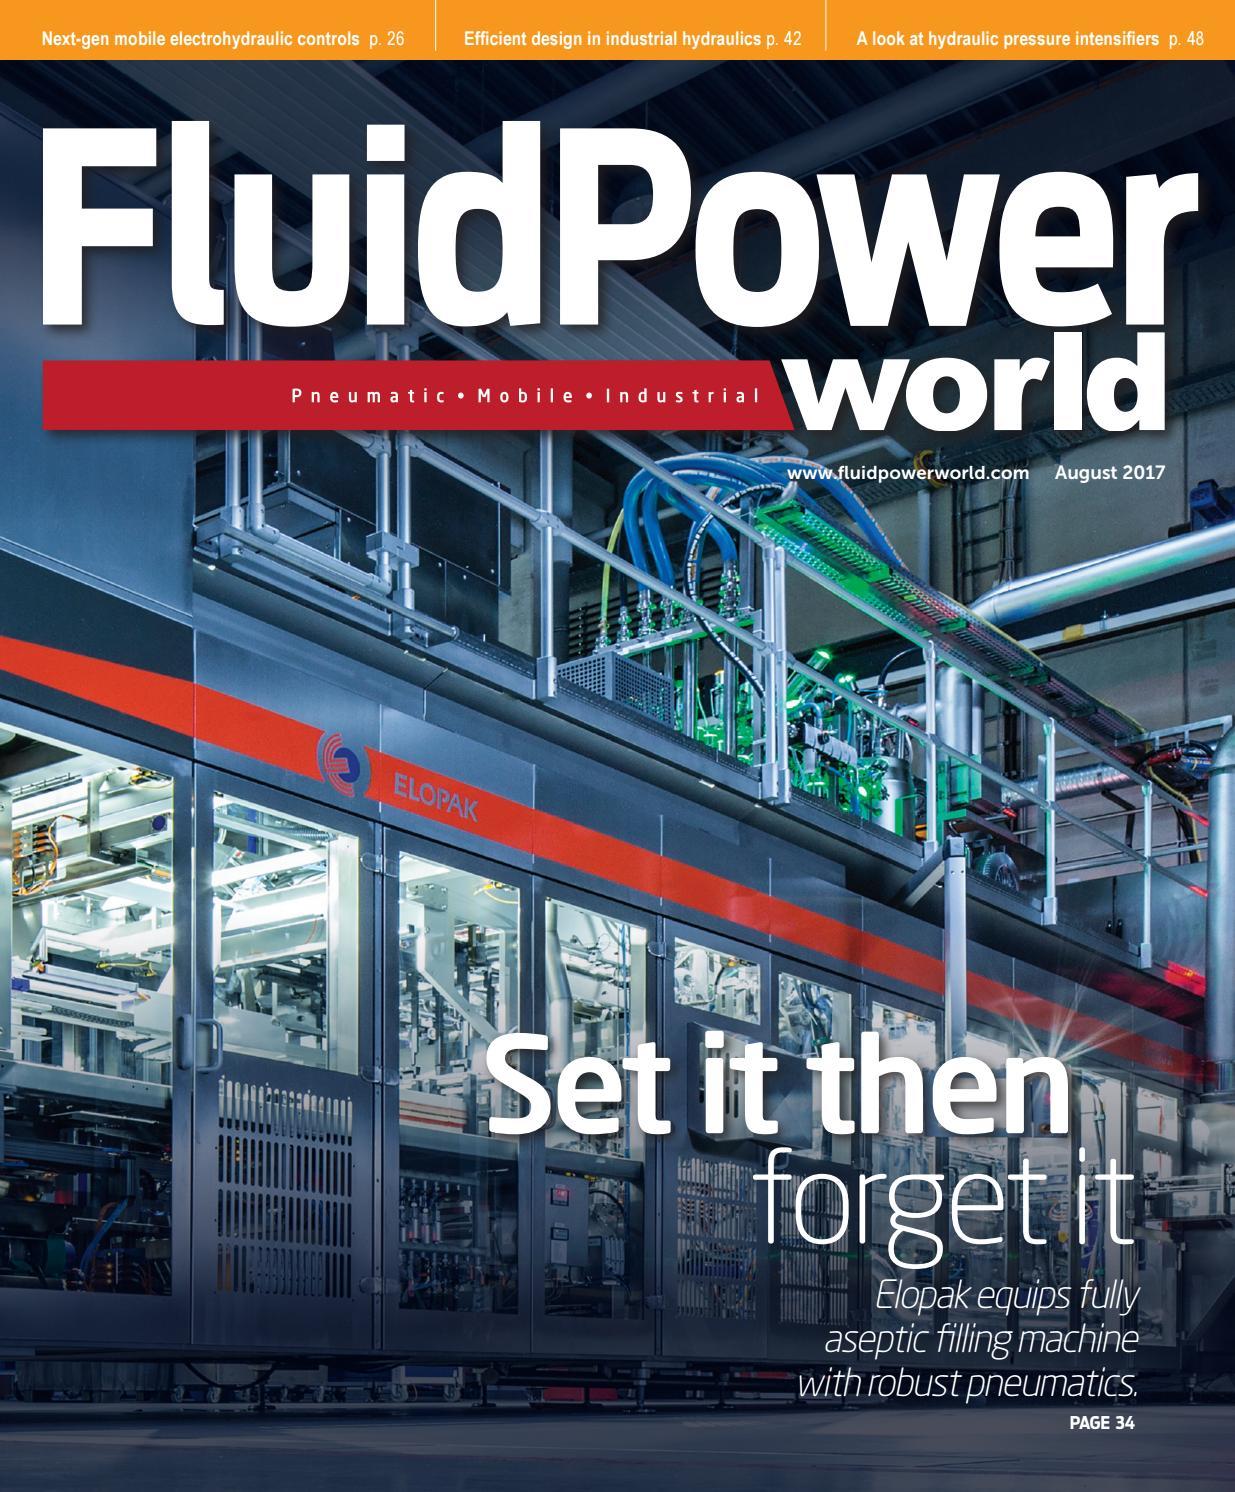 Fluid Power World August 2017 By Wtwh Media Llc Issuu Fan Control Switches At Aubuchon Hardware